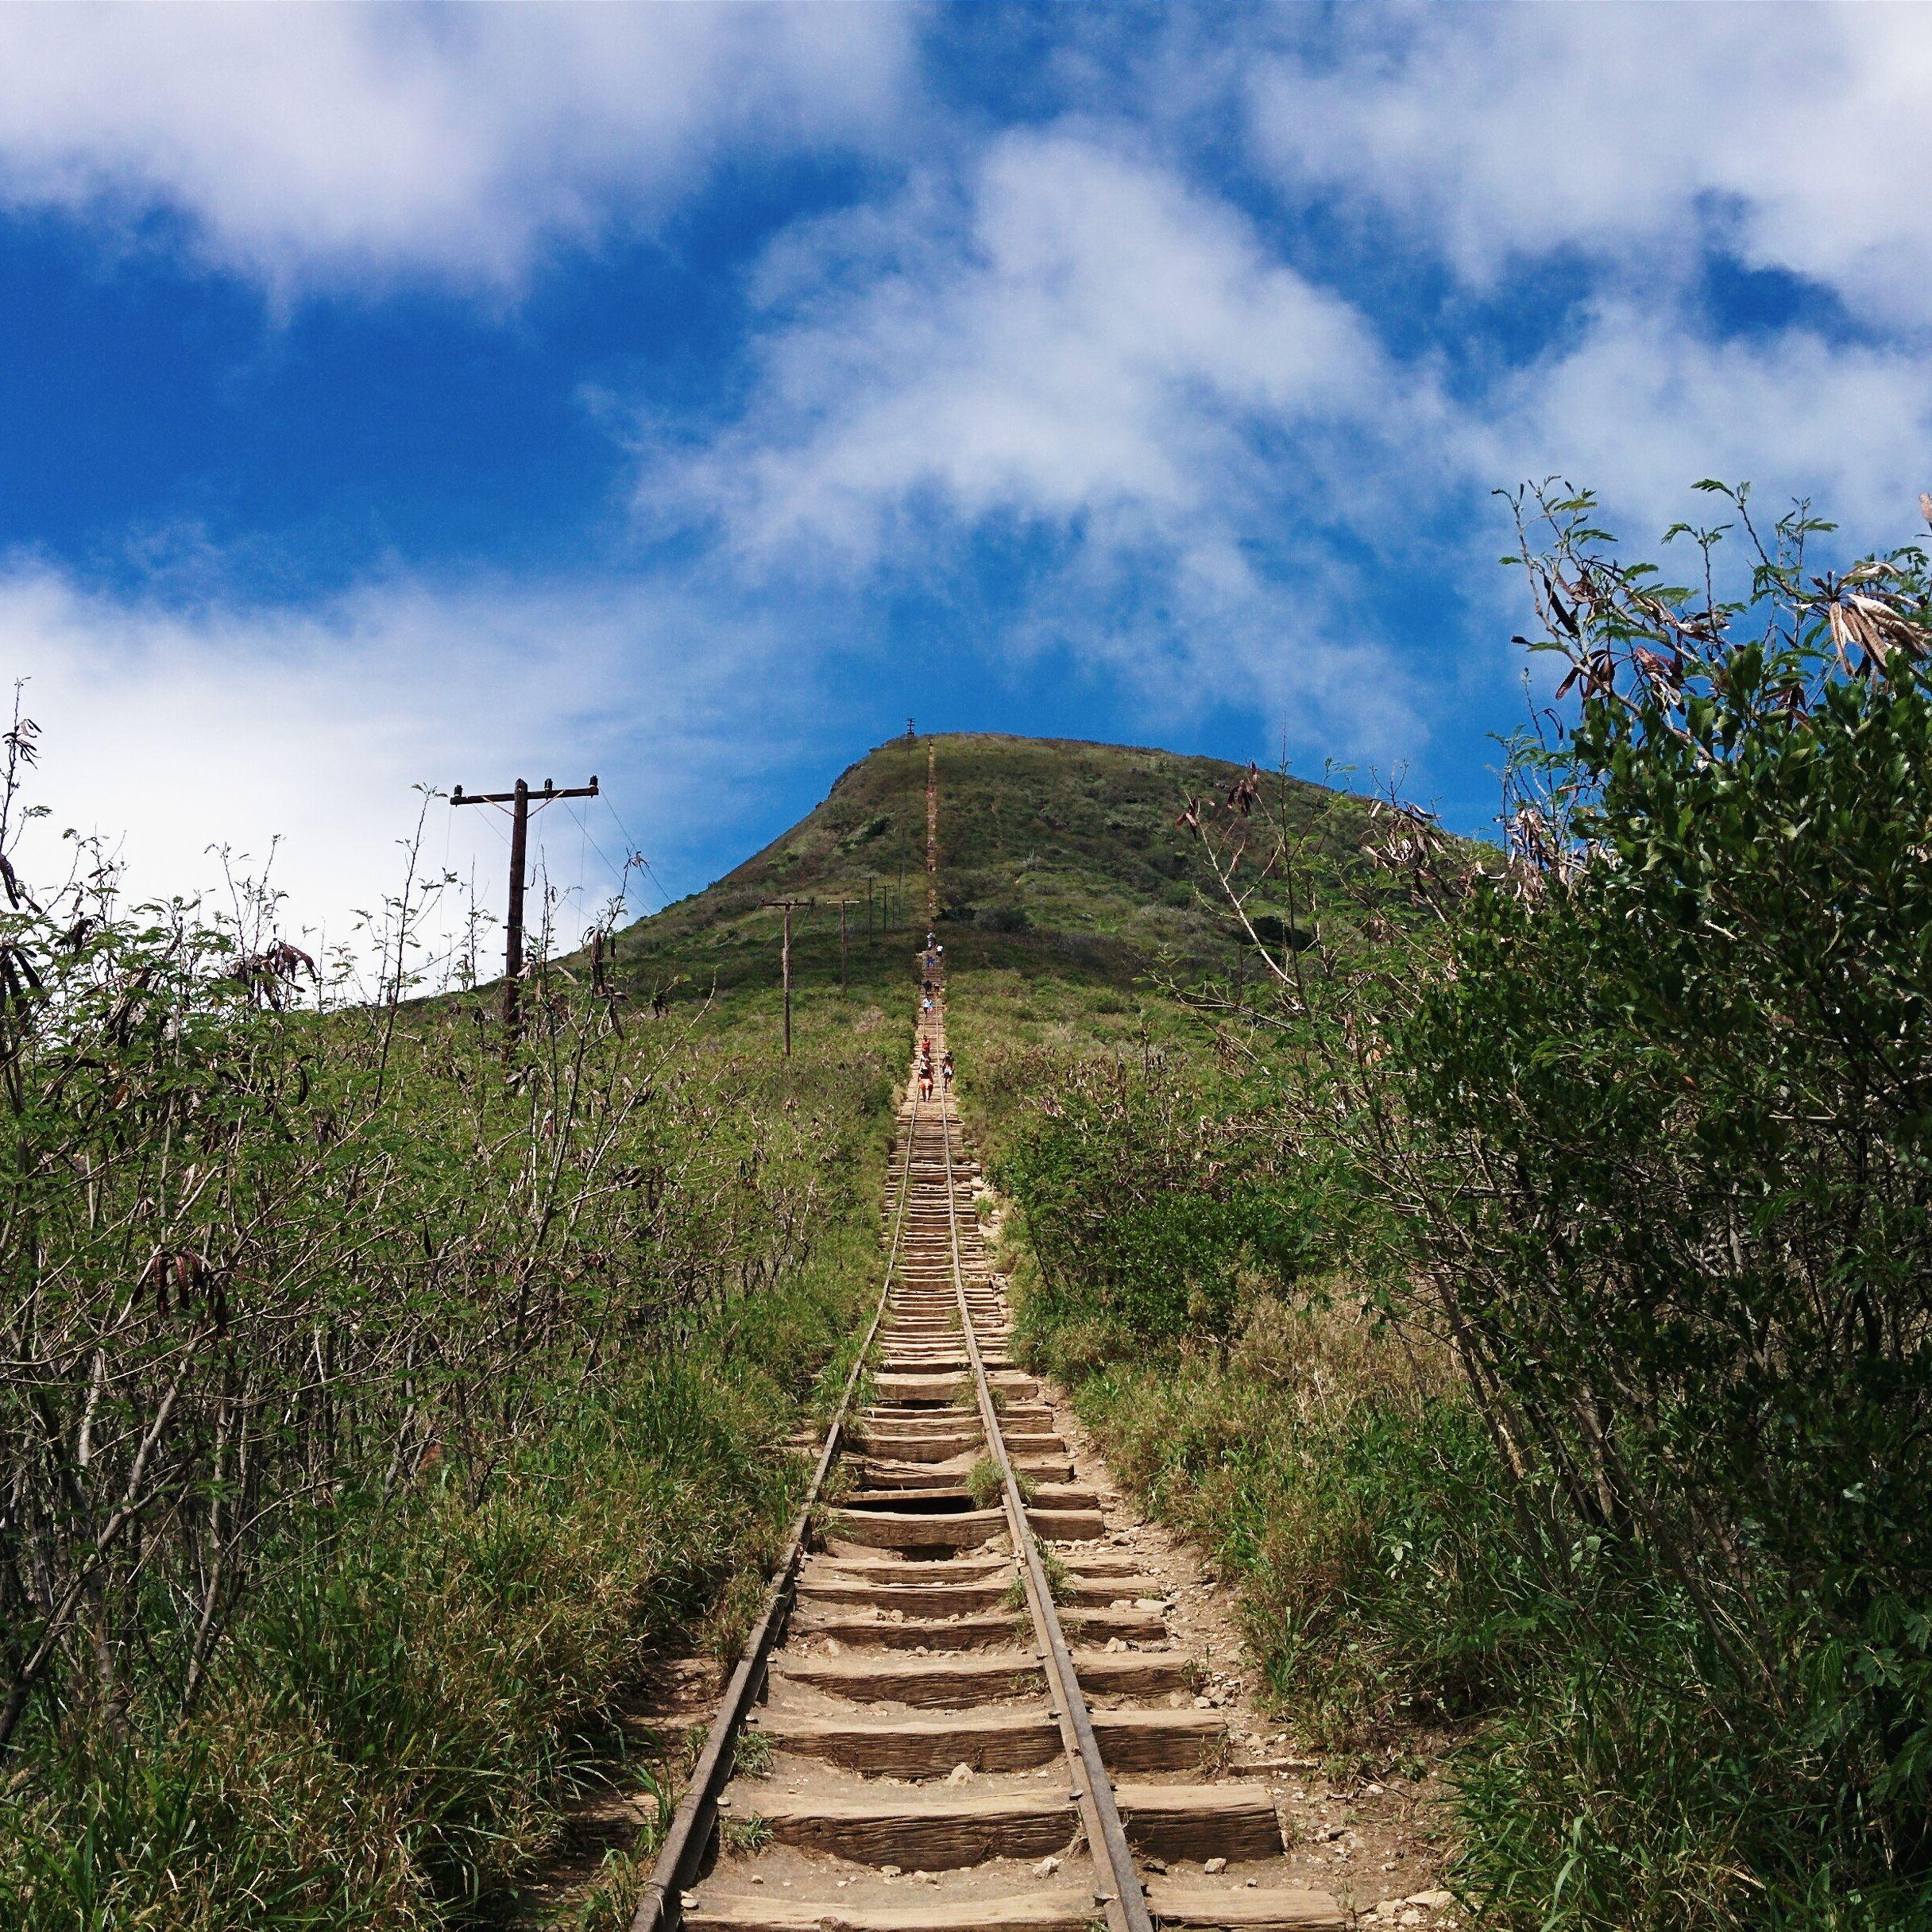 Hiking the Koko Head Stairs in Hawaii